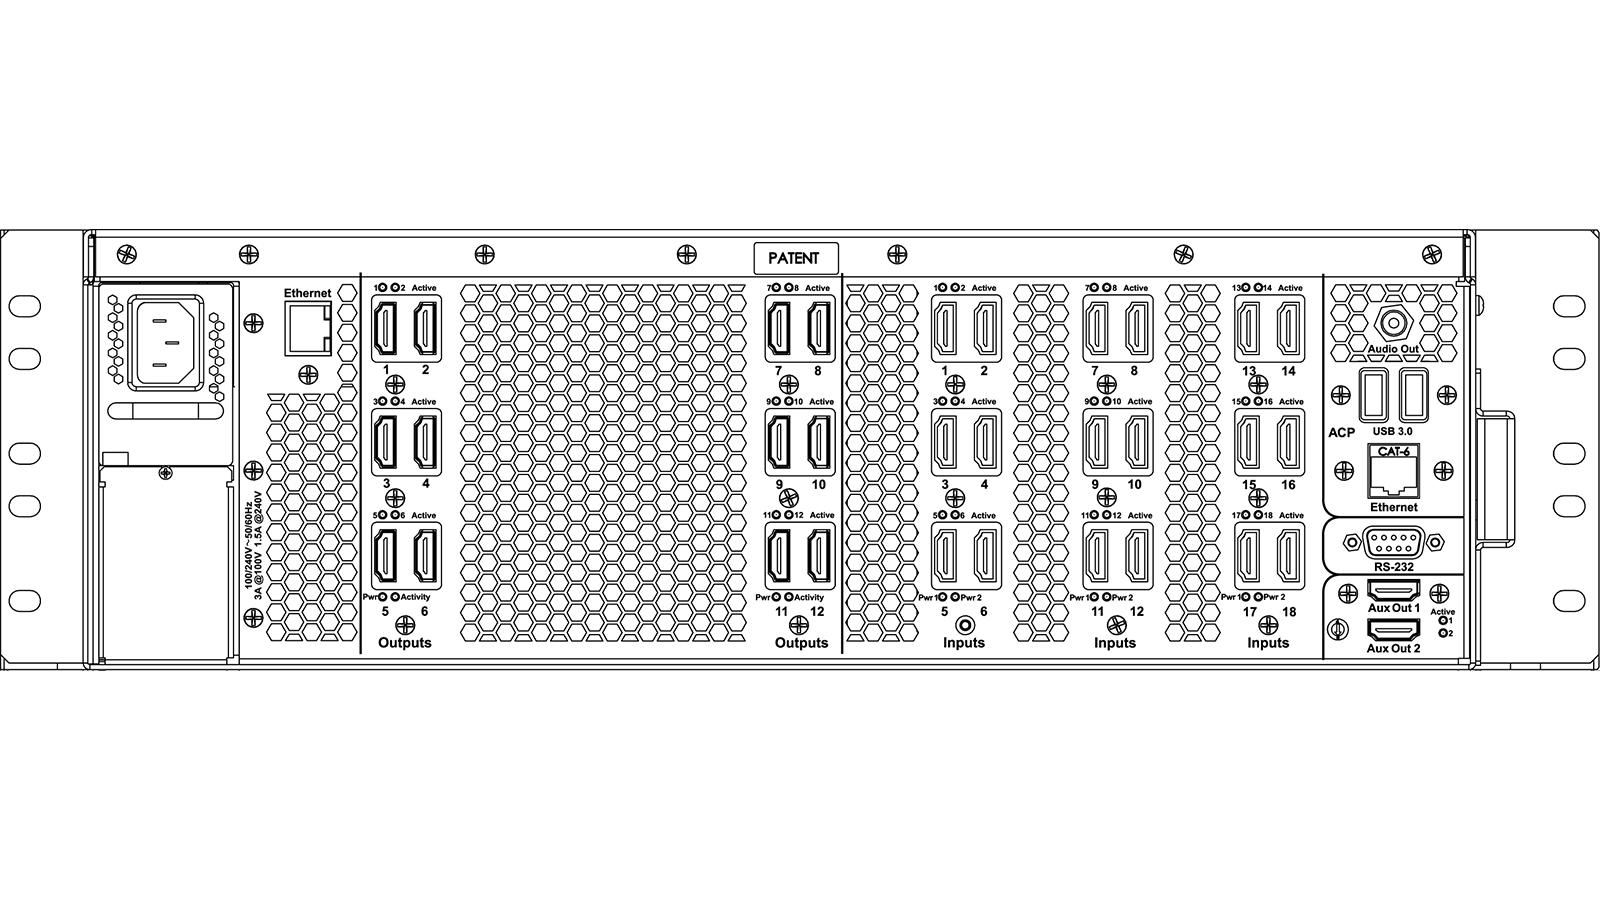 MWV 500: Back Panel